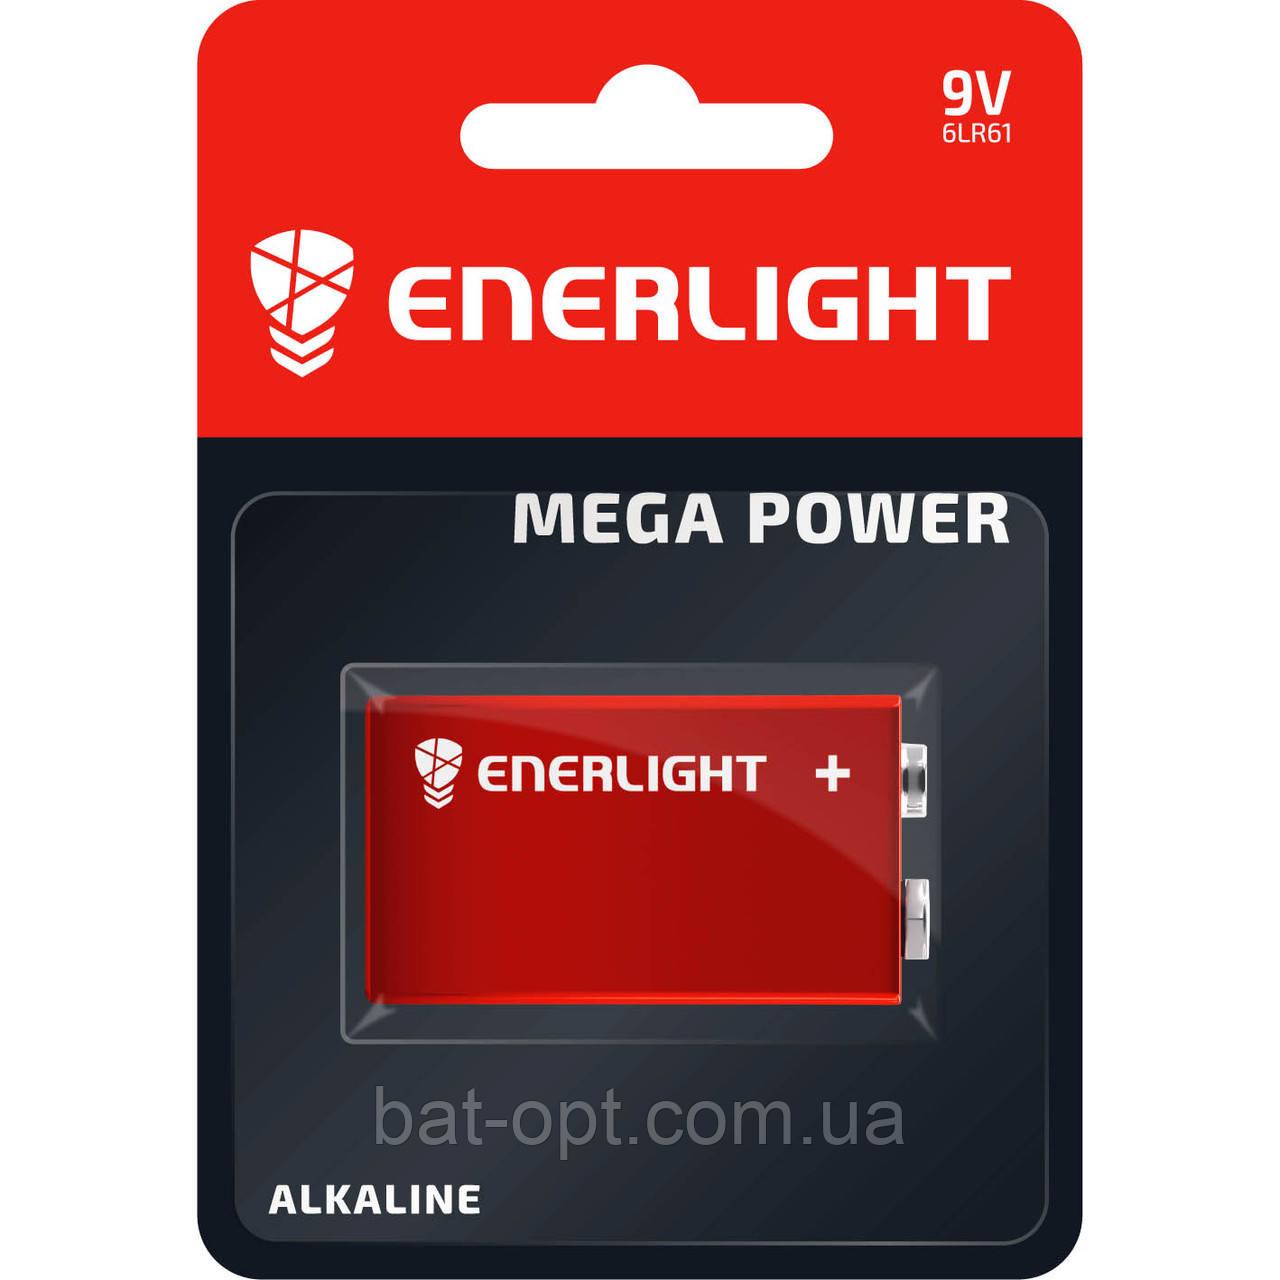 Батарейка щелочная Enerlight Mega Power 9V 6LR61 крона (блистер)